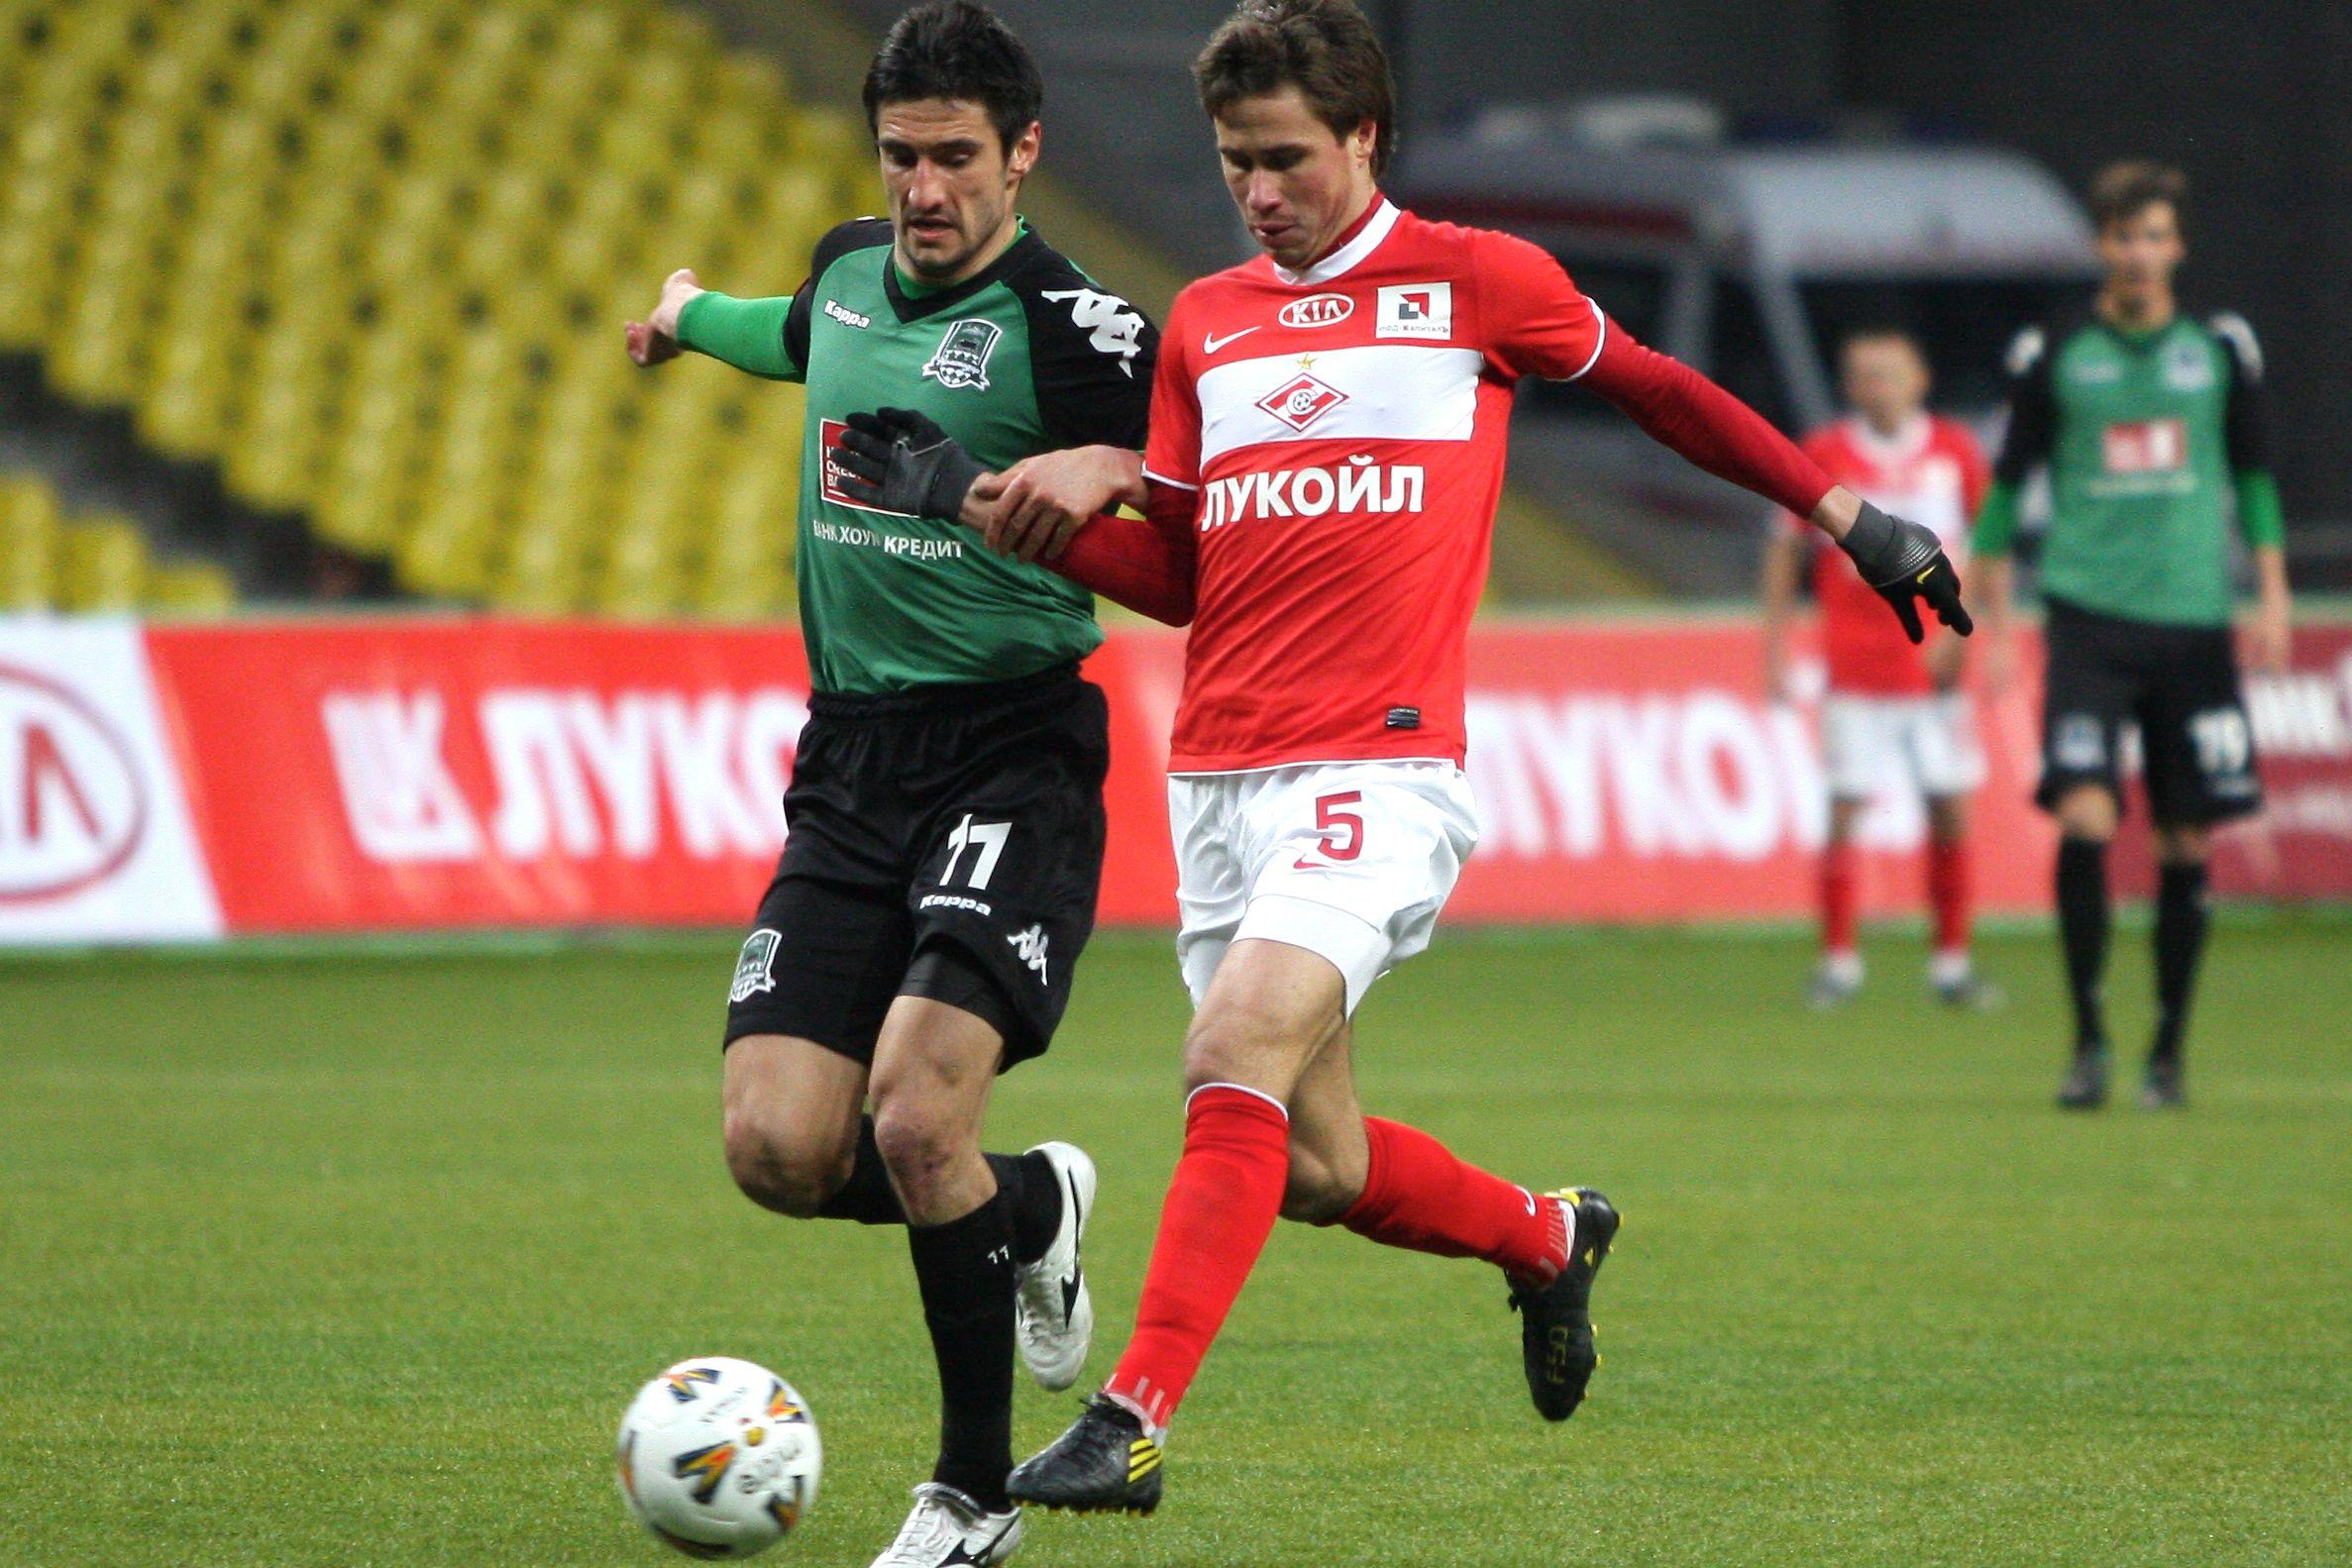 Тренеру Алании Гогниеву грозит до 2 лет дисквалификации за удар арбитра